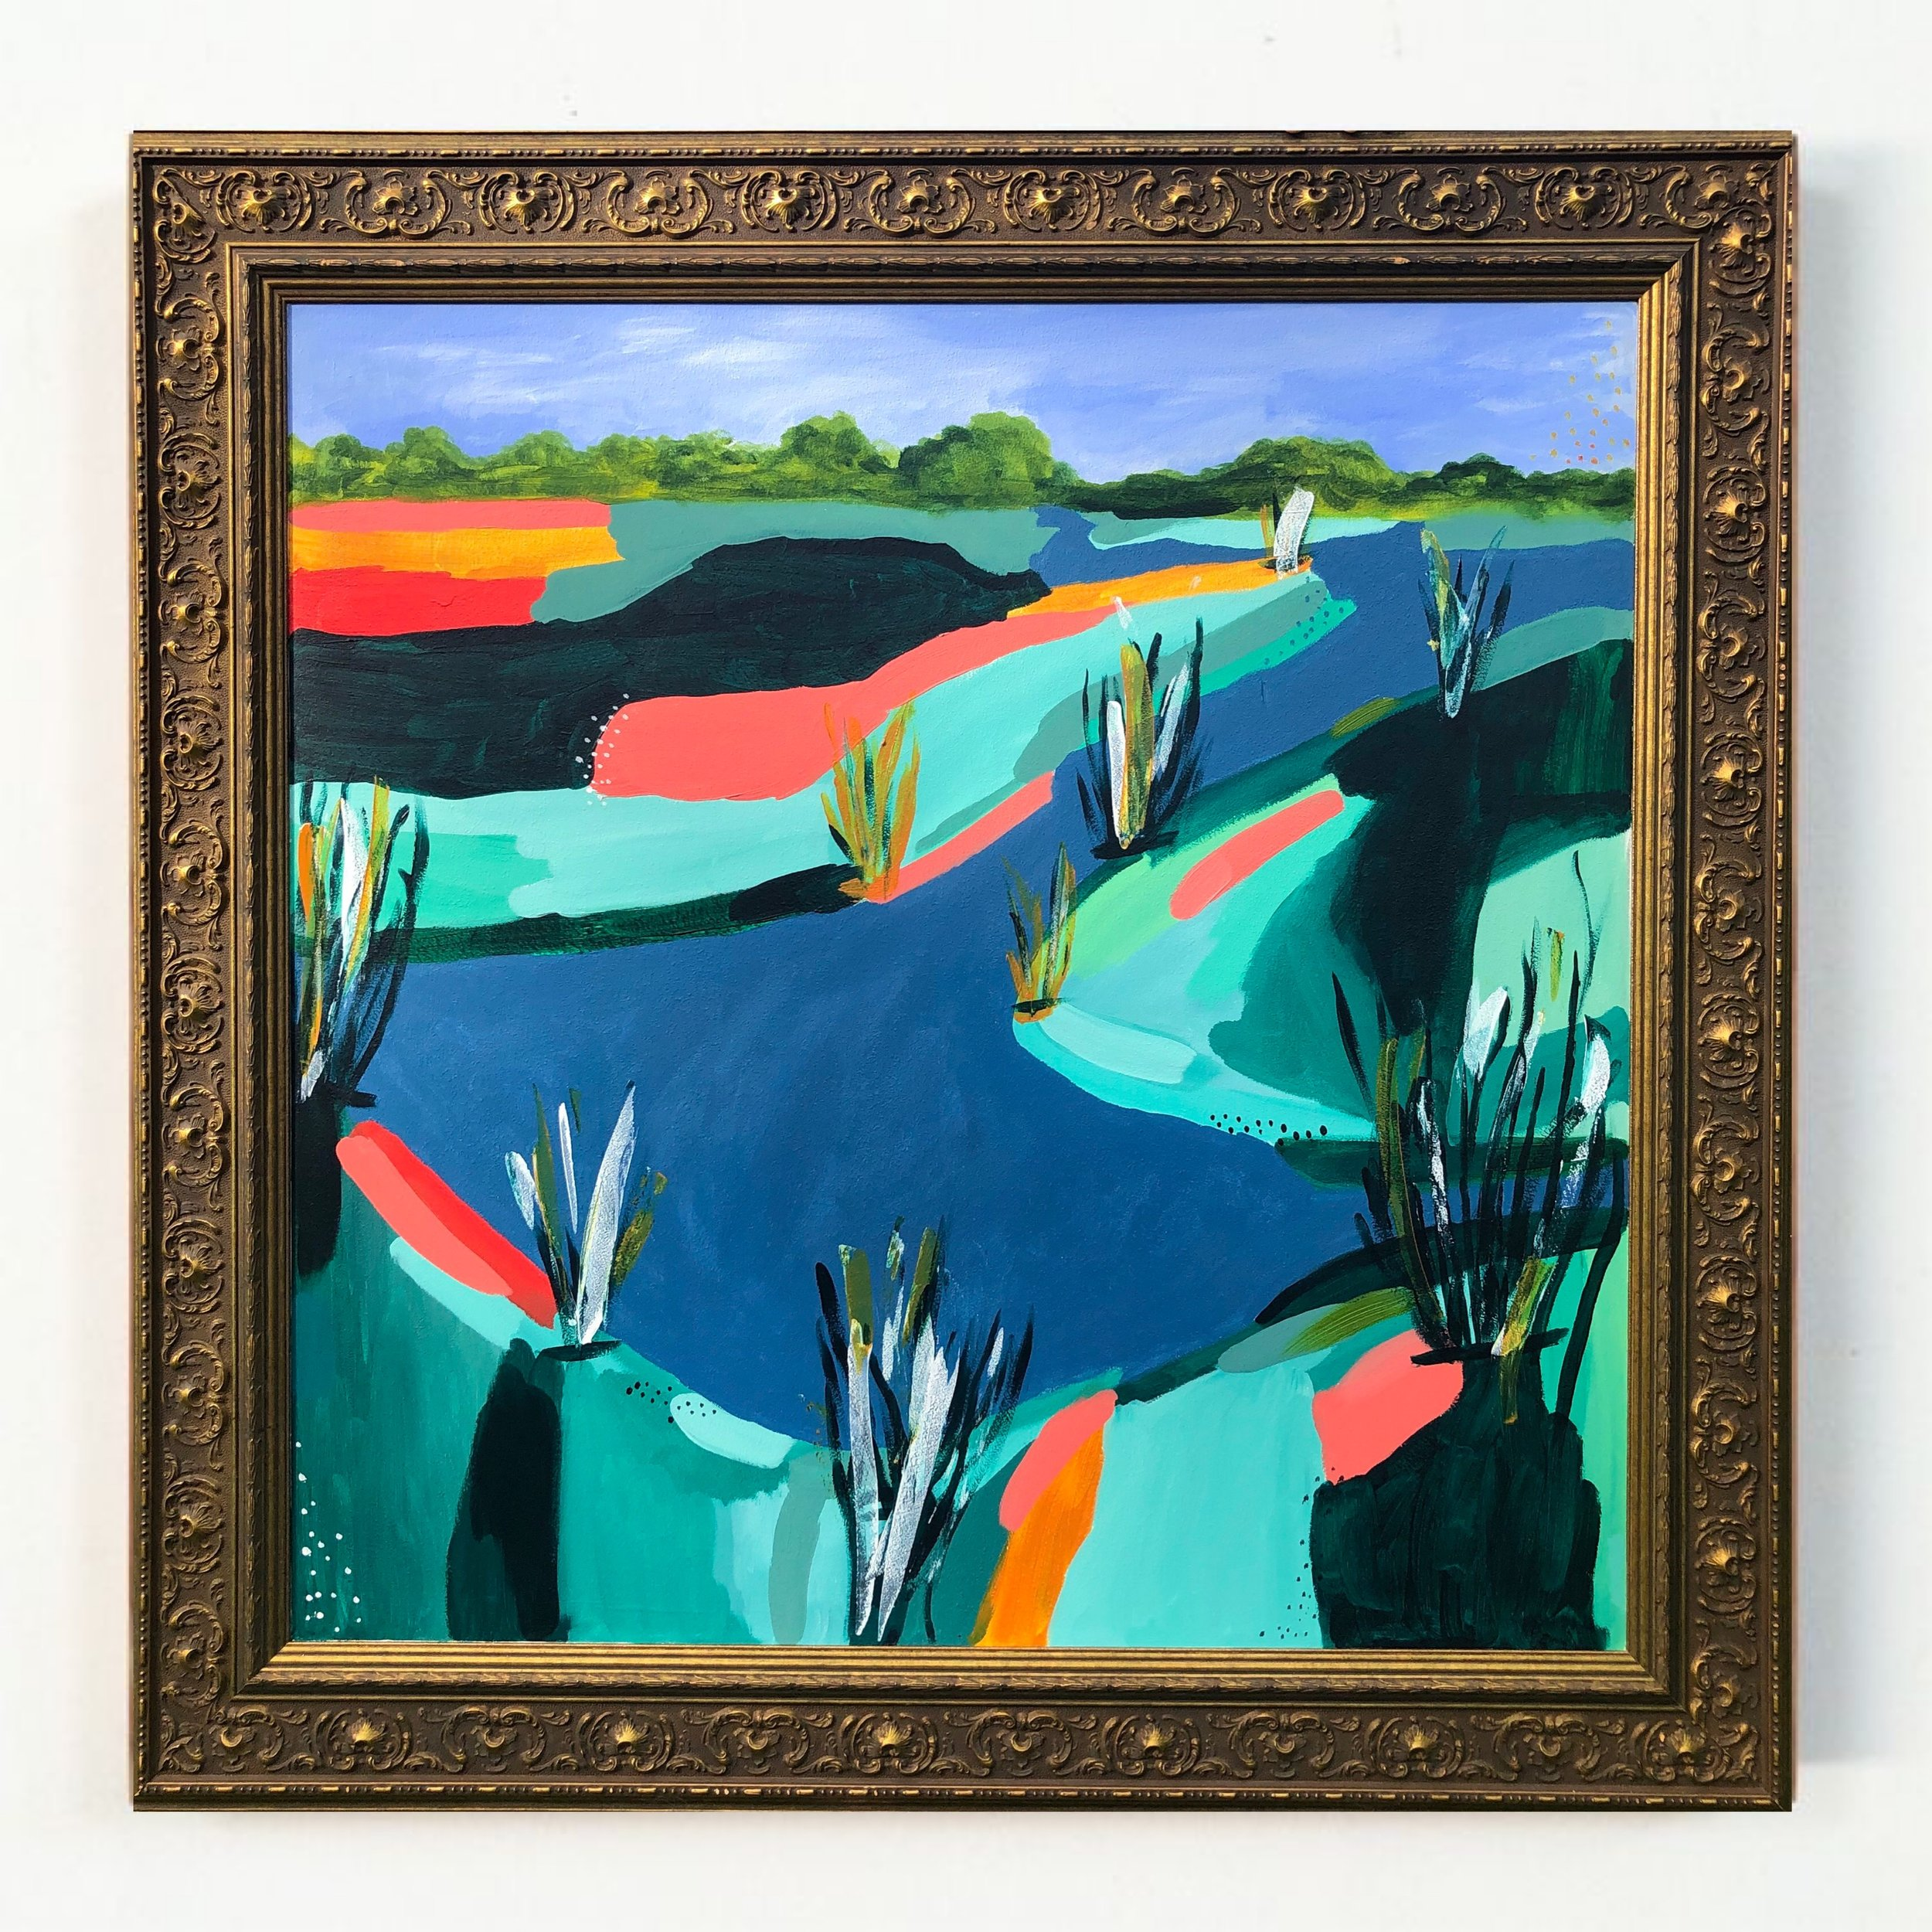 "Midday Marsh, 2019 - 43x43'"" including frameacrylic on panel$1750"